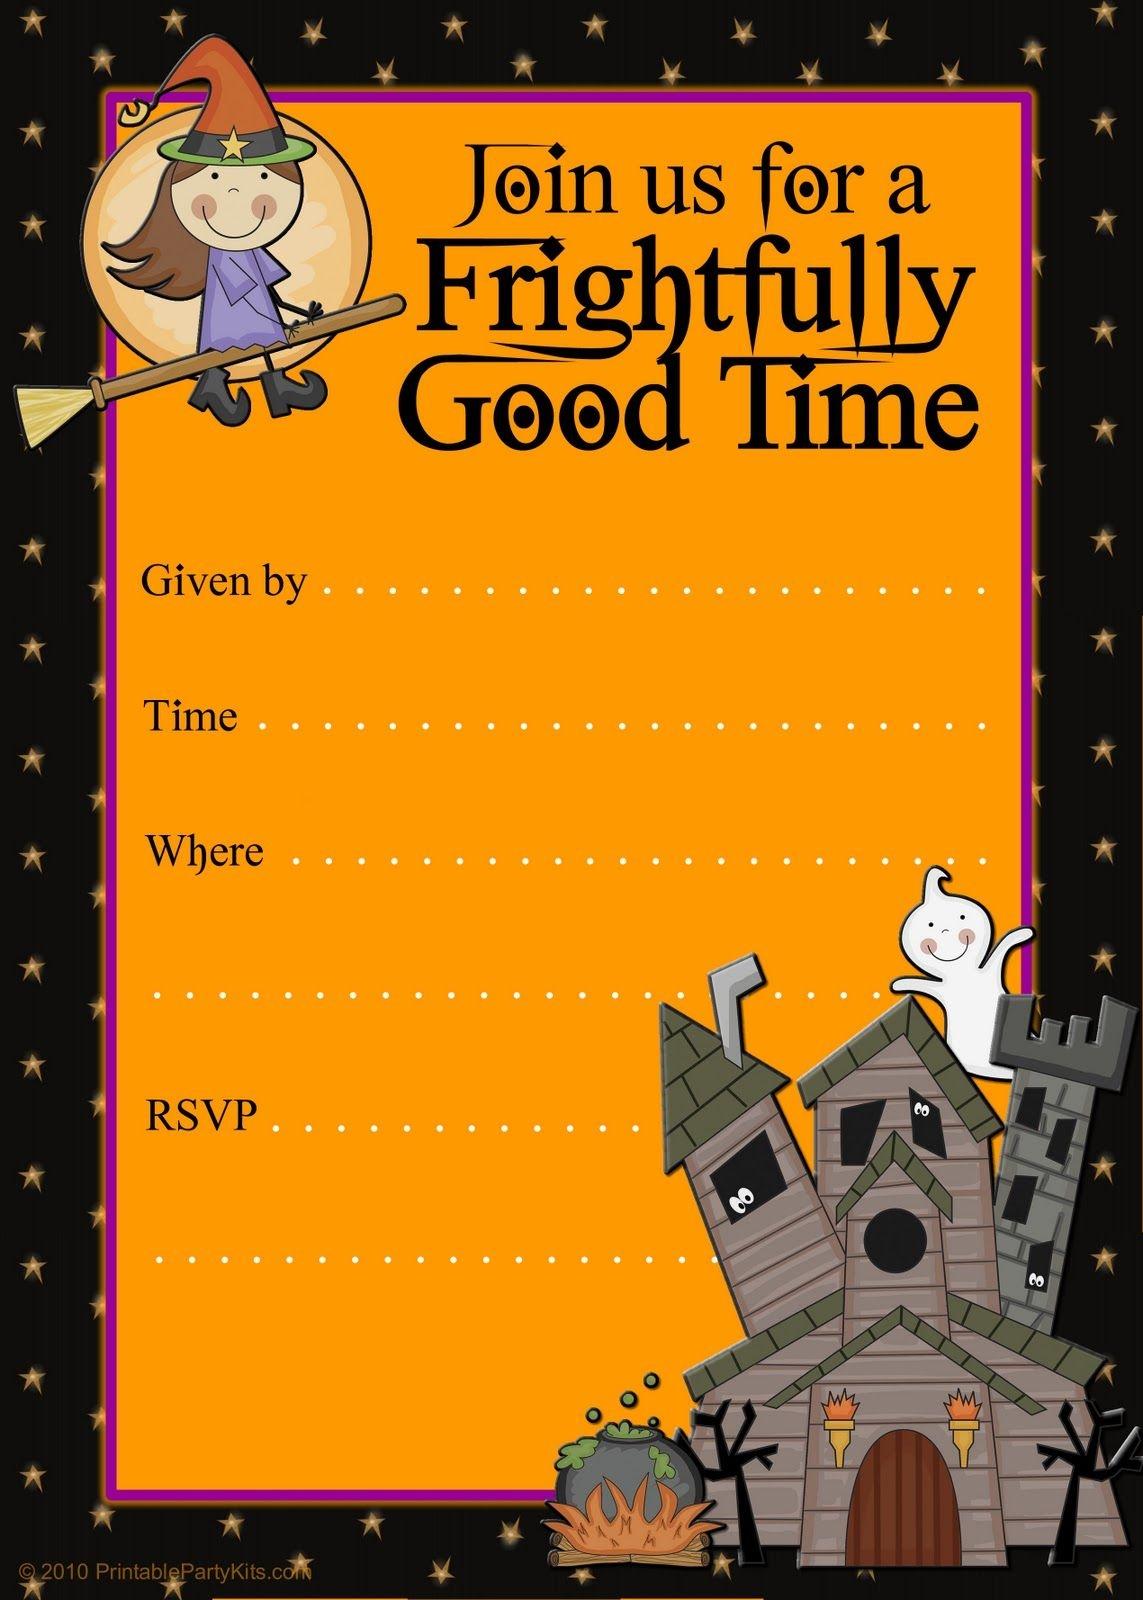 Free Halloween Flyer Invitations Printable   Food   Halloween Party - Free Printable Birthday Party Flyers